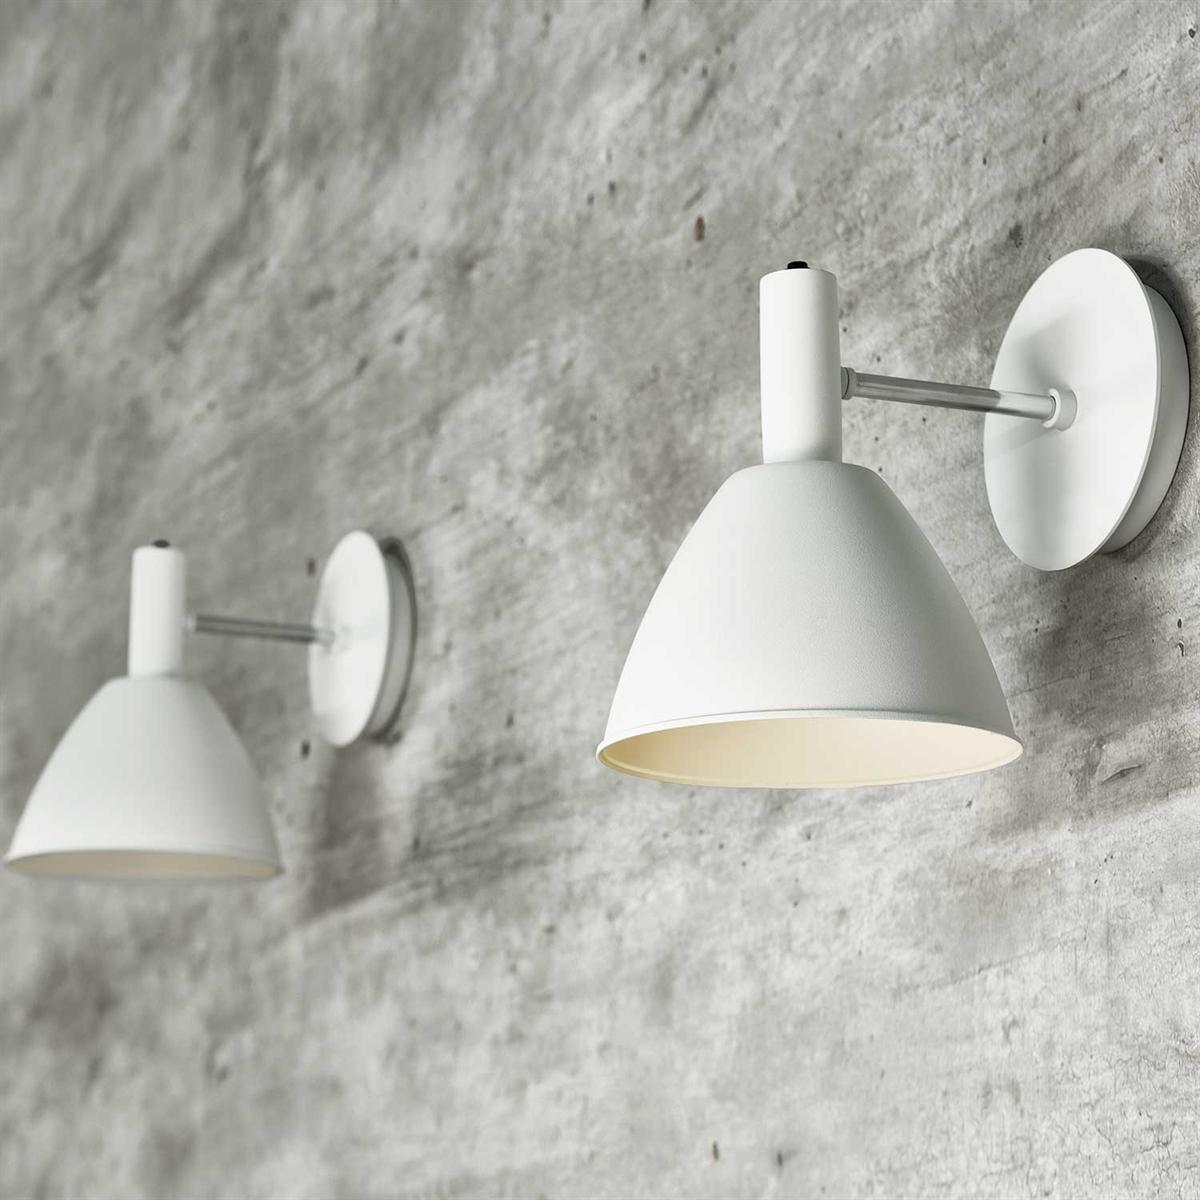 Picture of: Lumini Bauhaus 90 Vaeglampe I Hvid Eller Sort